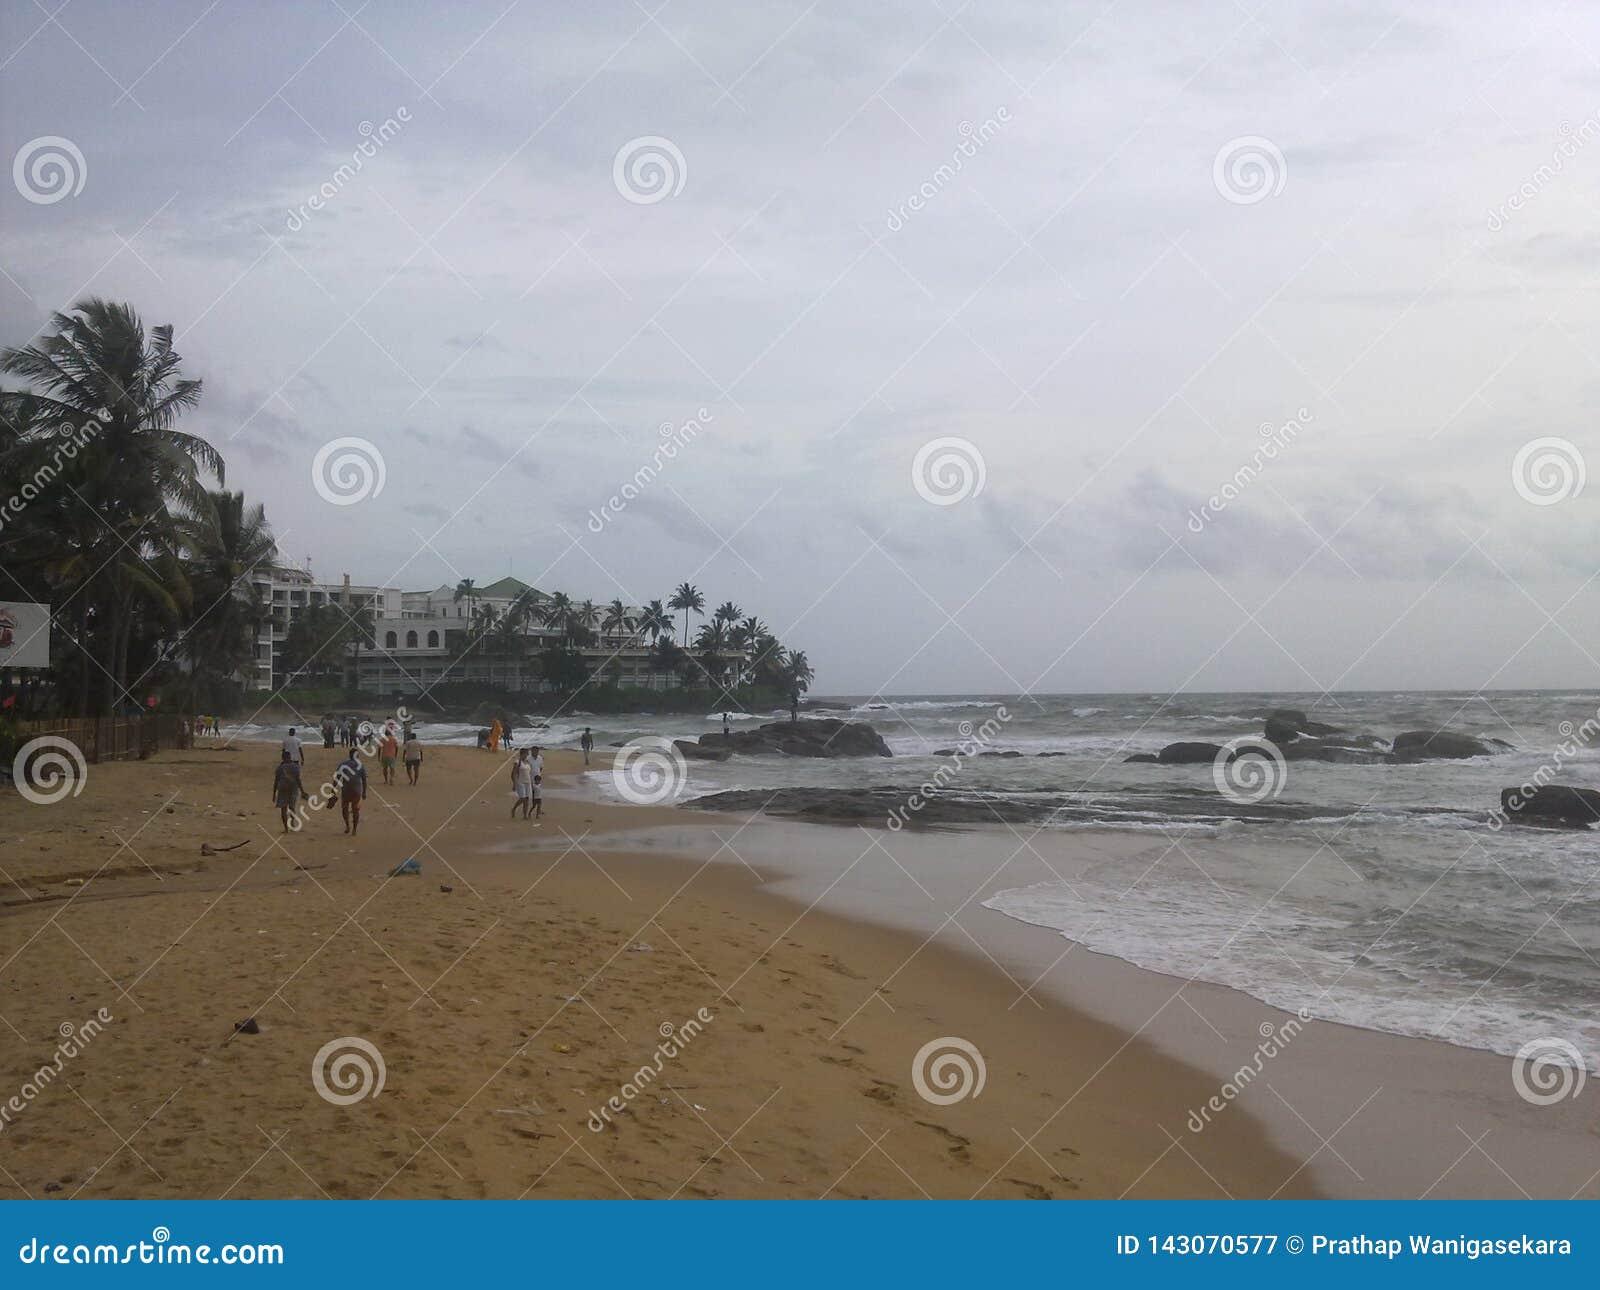 Mount lavinia beach in sri lanka